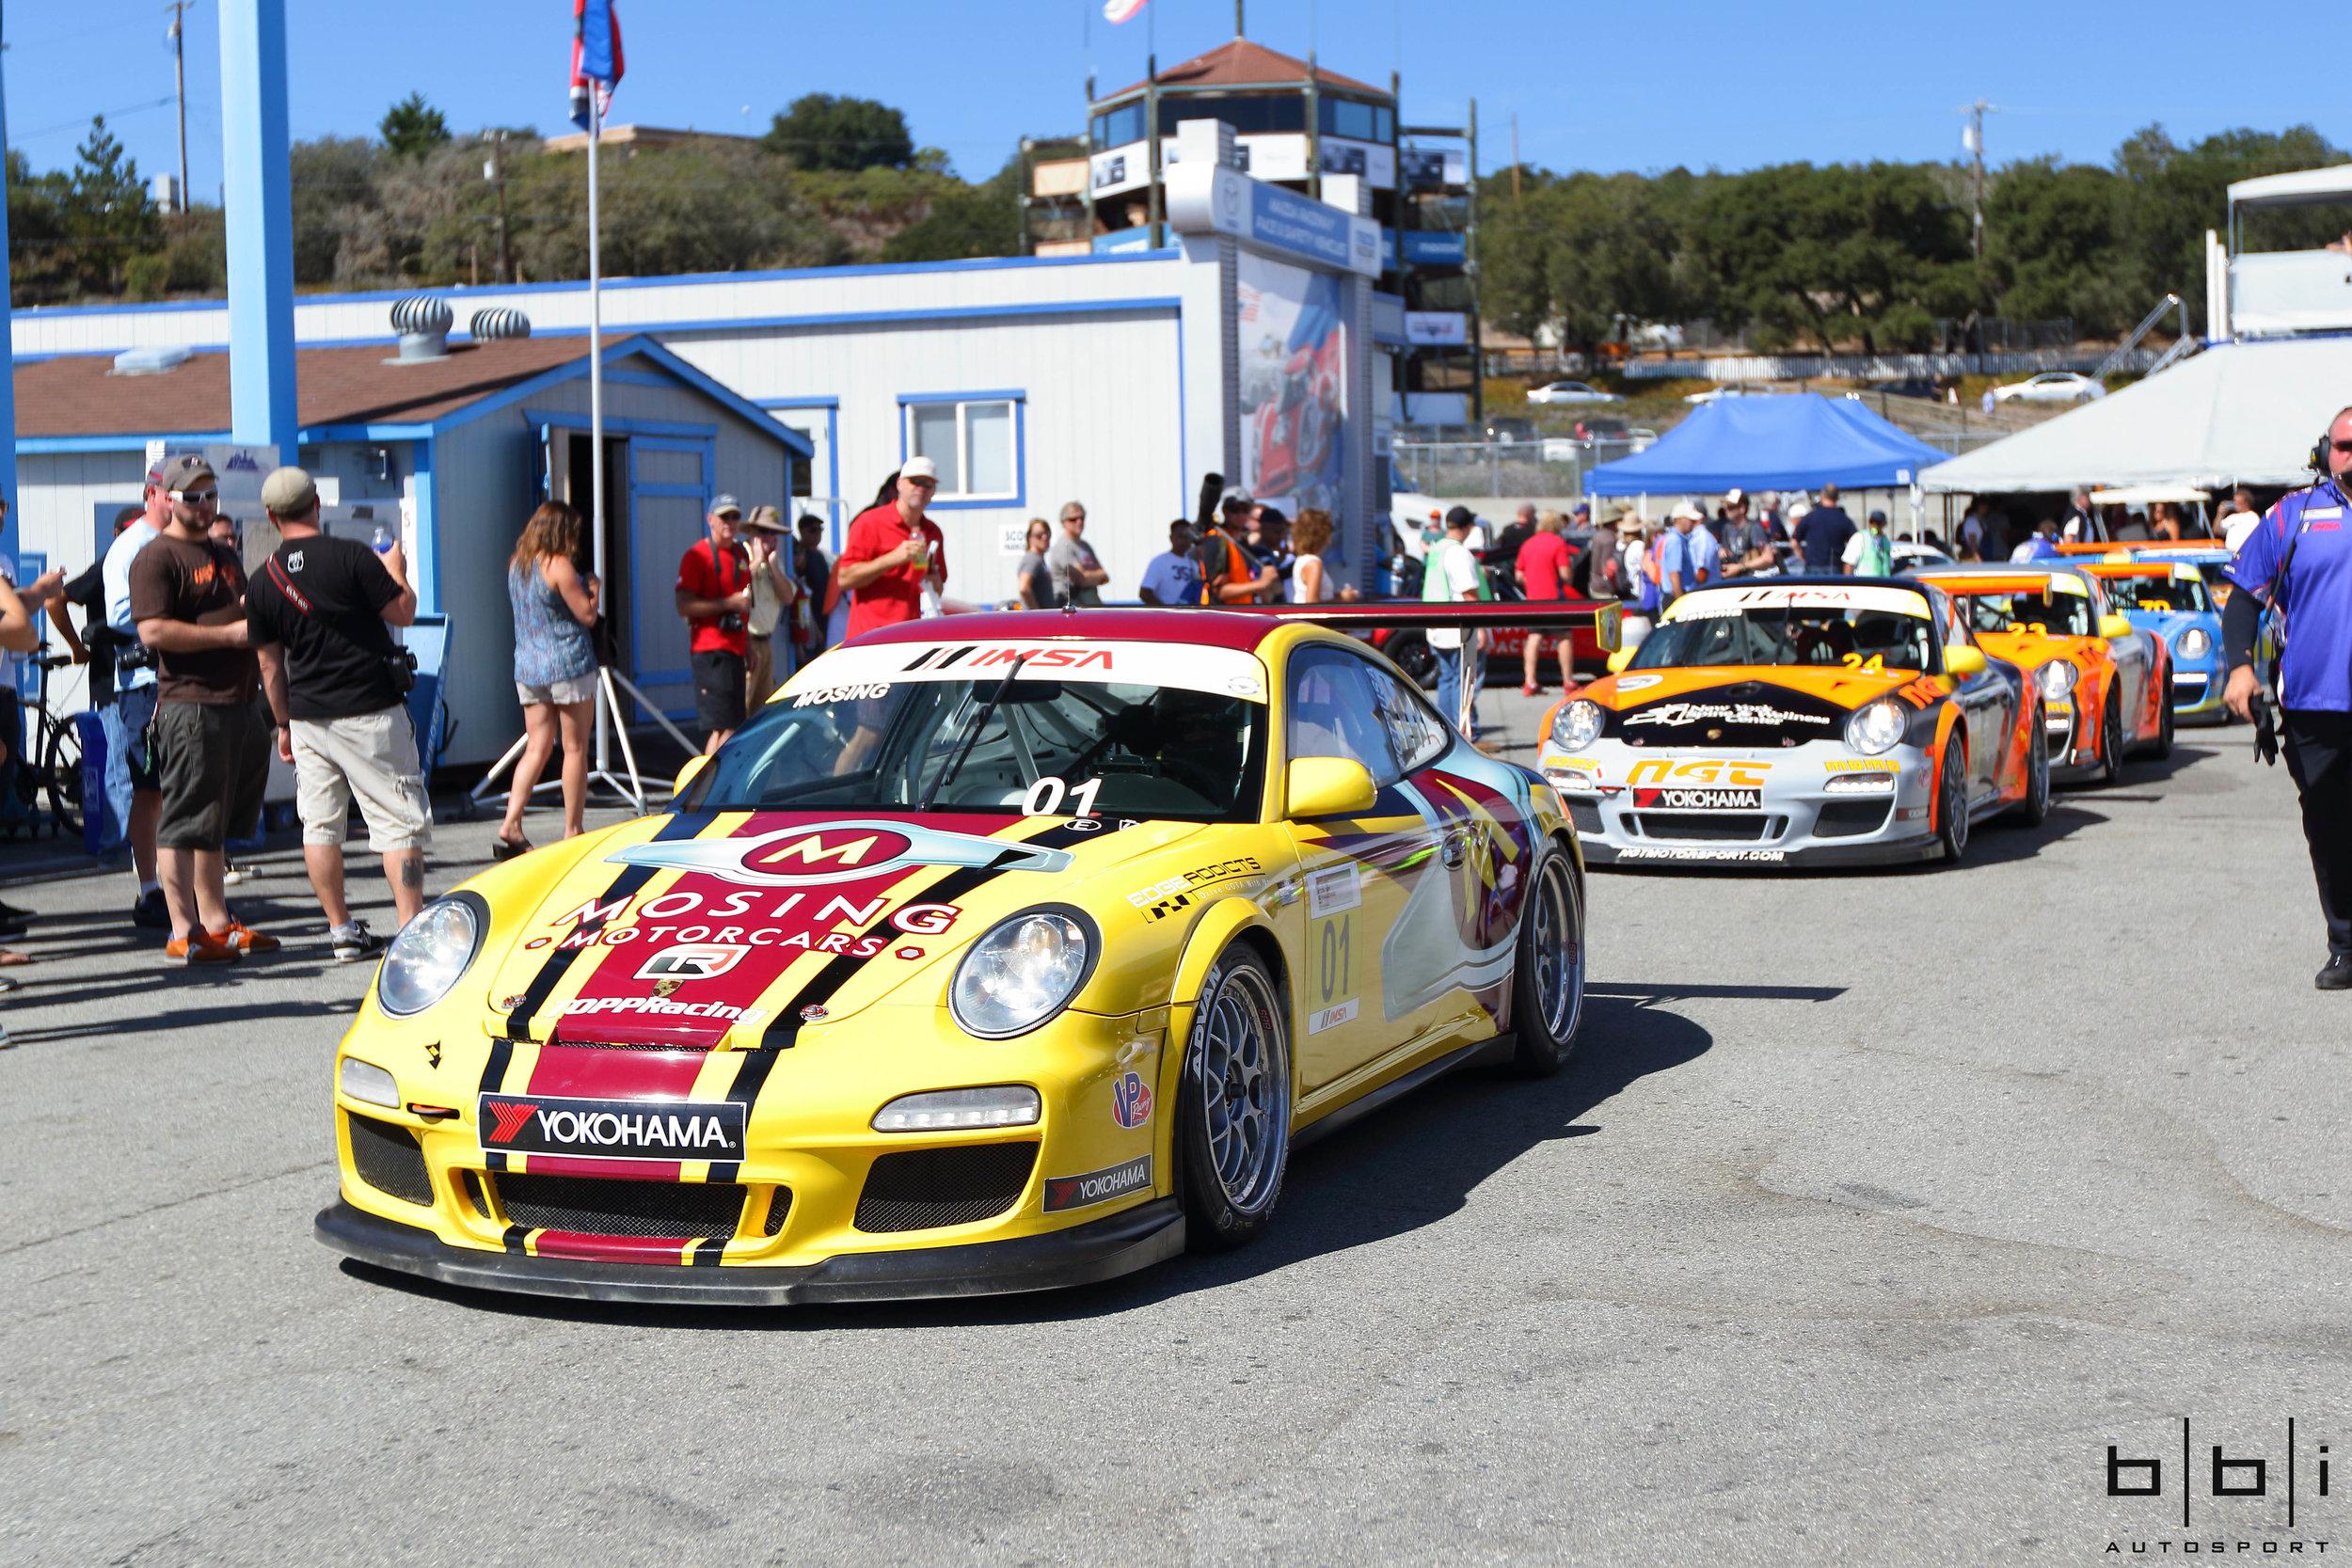 2015 IMSA Cup Cars rolling through the paddock